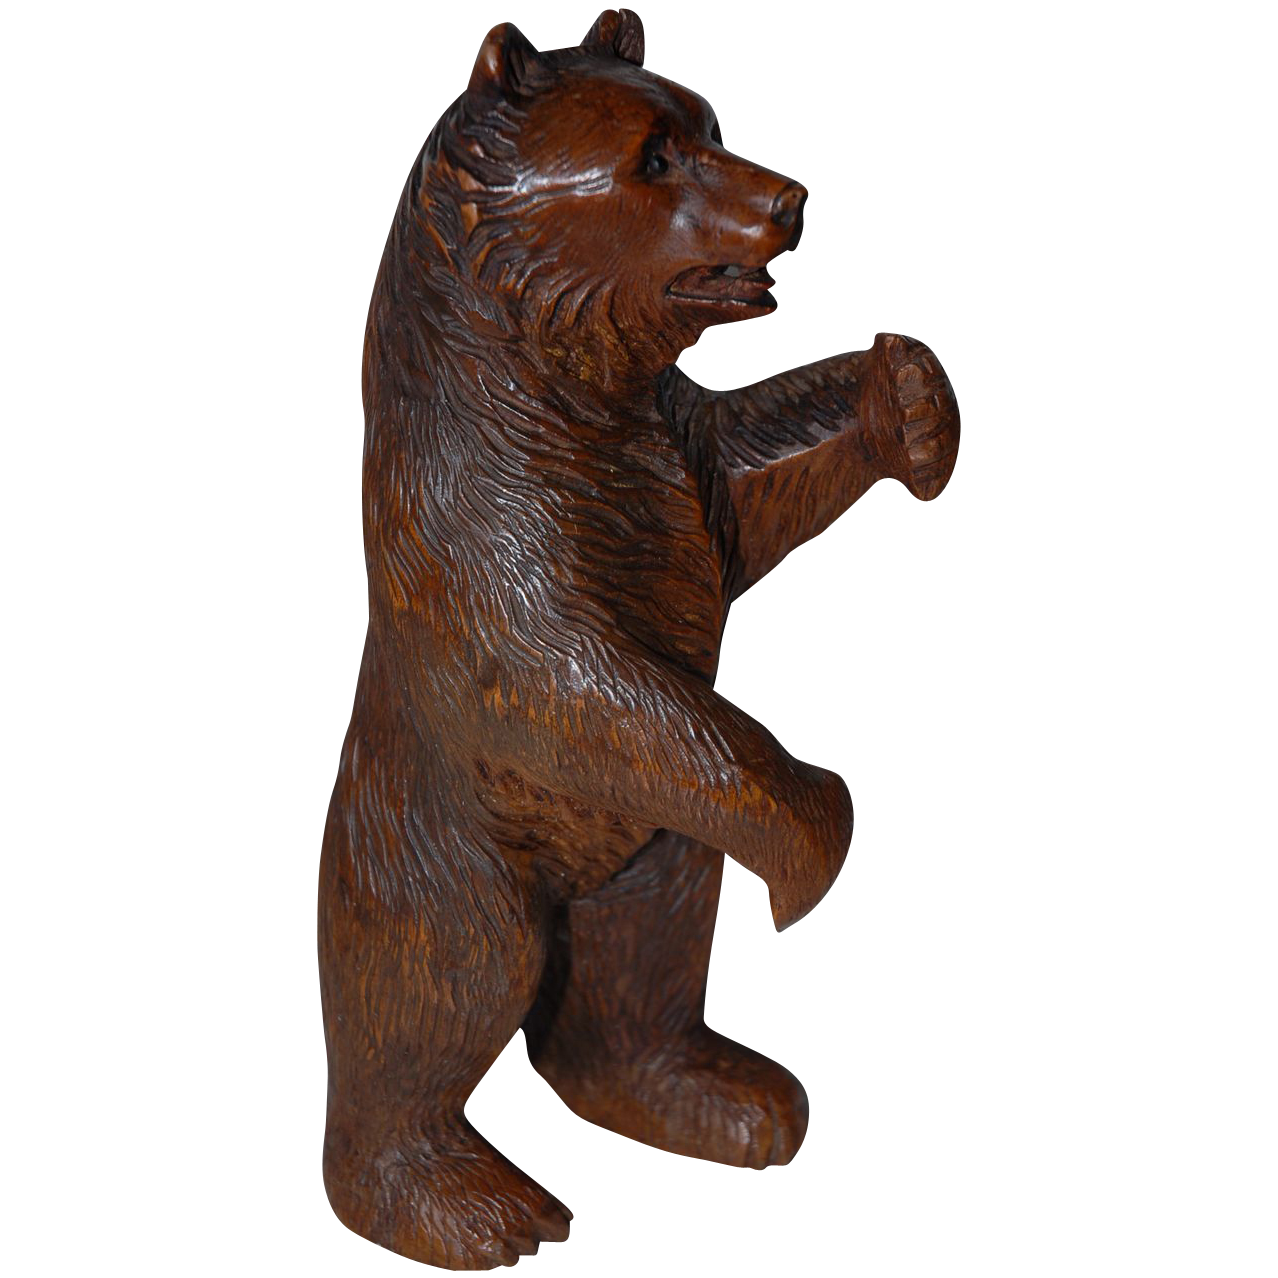 Huge Antique Victorian era Black Forest Bear Hand Carved  : 12851L from www.rubylane.com size 1278 x 1278 png 1089kB